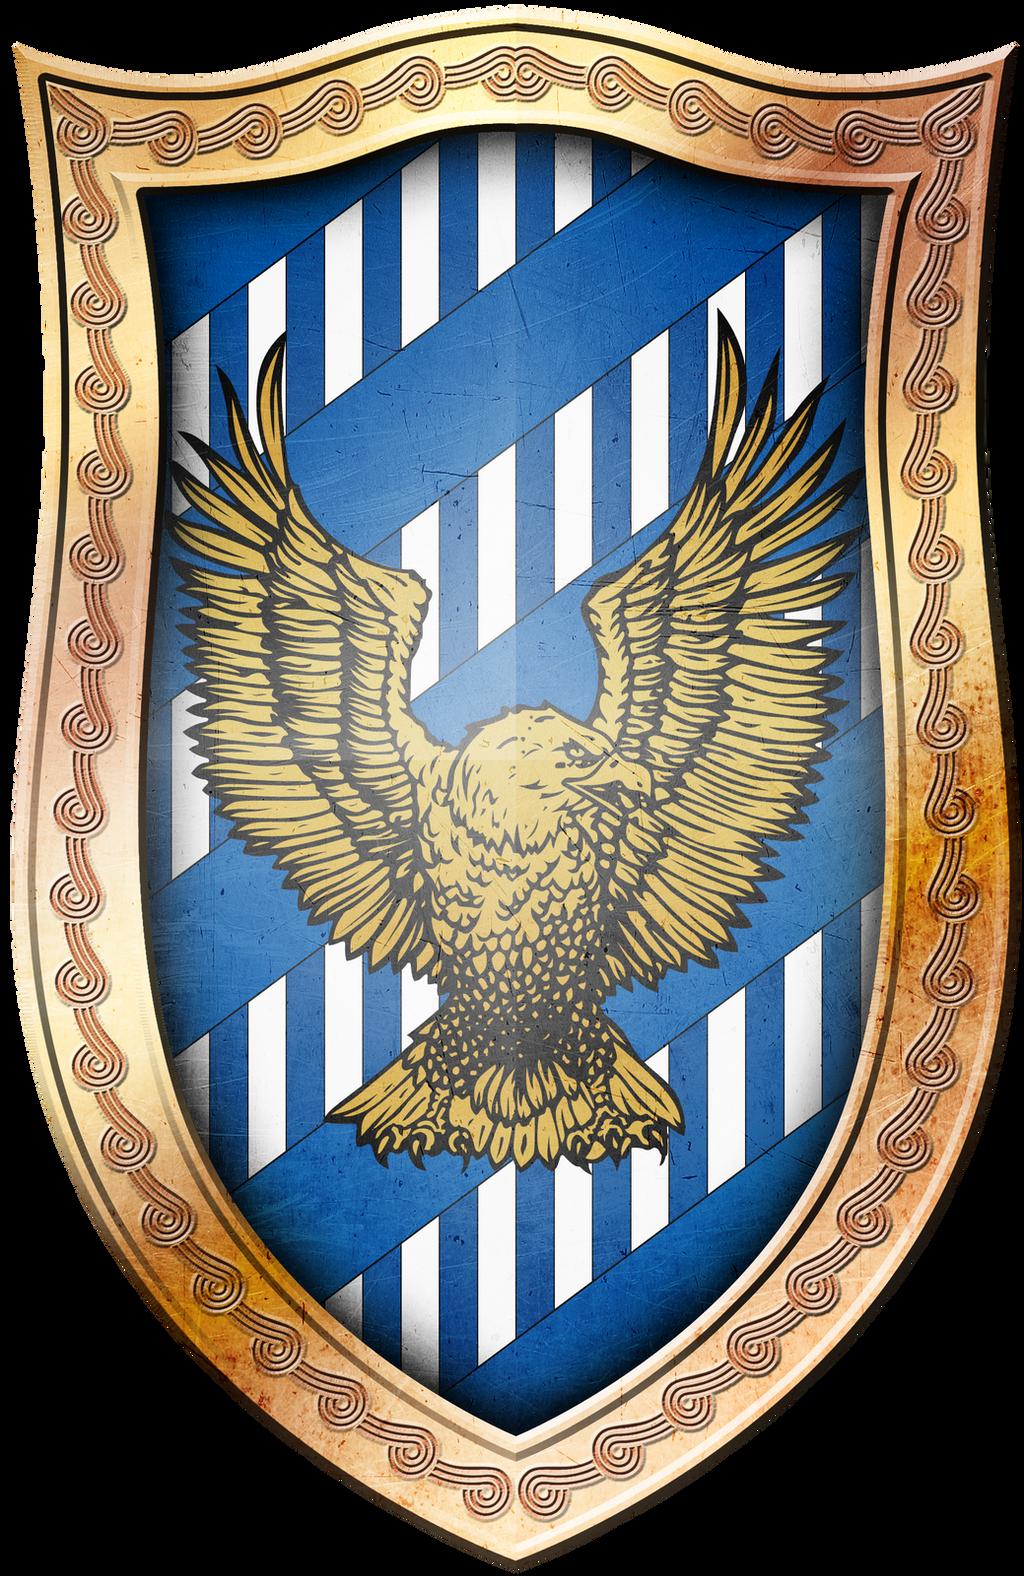 Slytherin Crest Transparent | www.imgkid.com - The Image ...